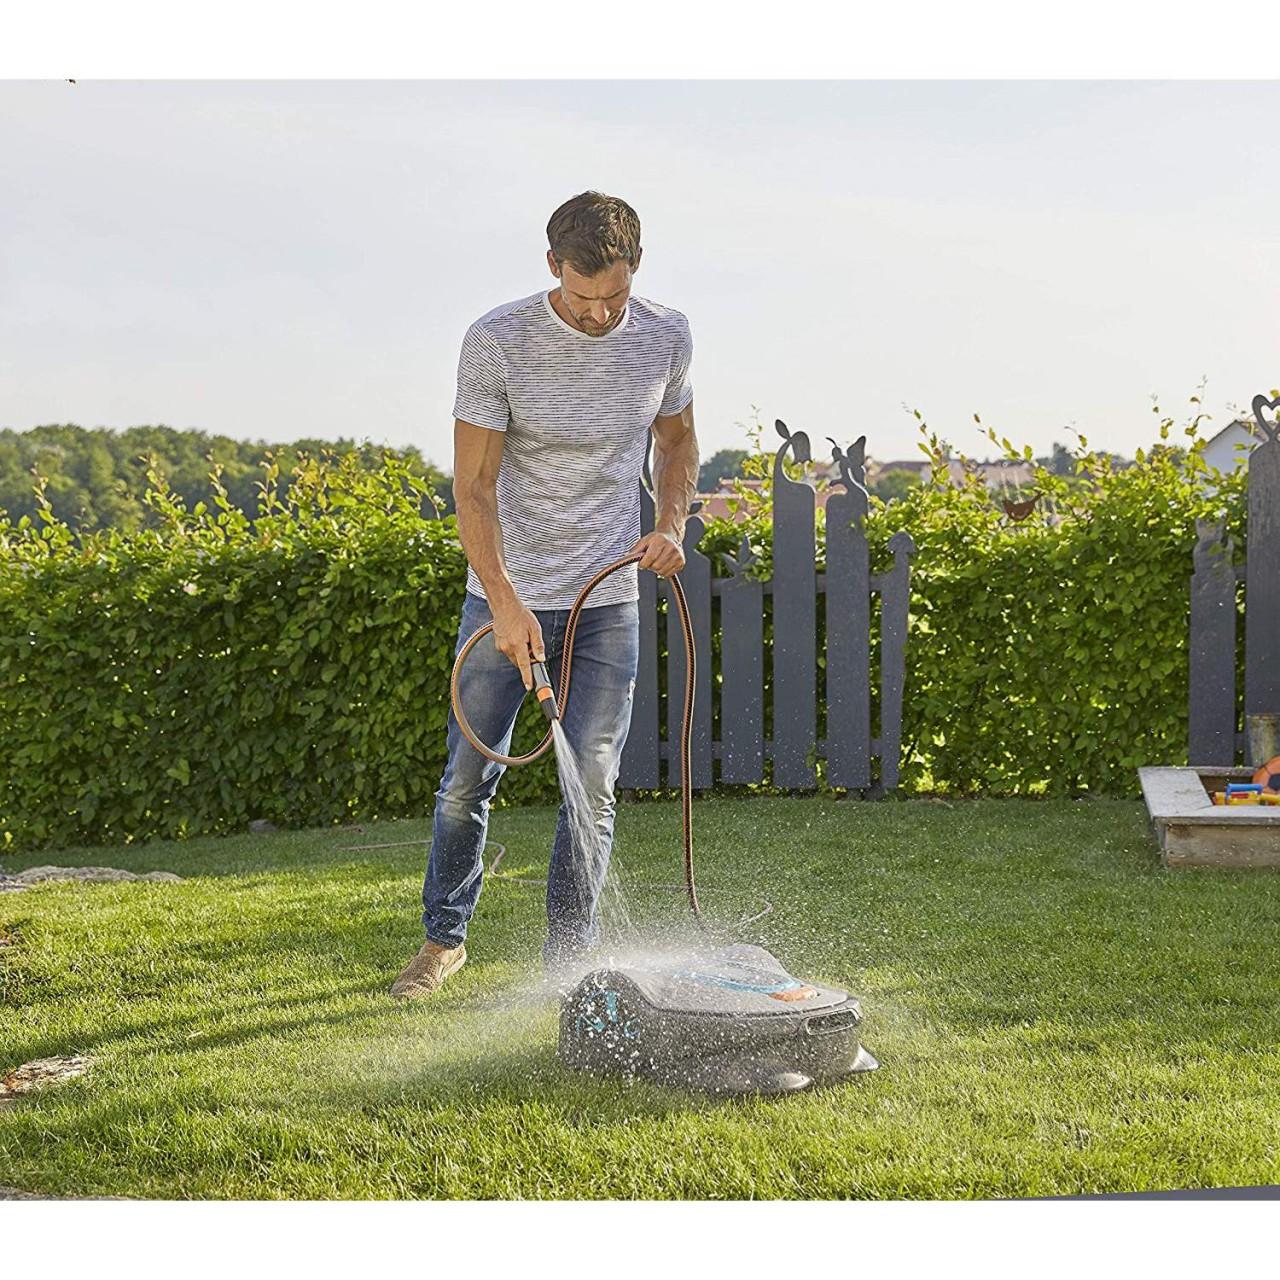 Gardena SILENO life 15103-20 Mähroboter Rasenmäher Roboter bis zu 1.250m² Garten